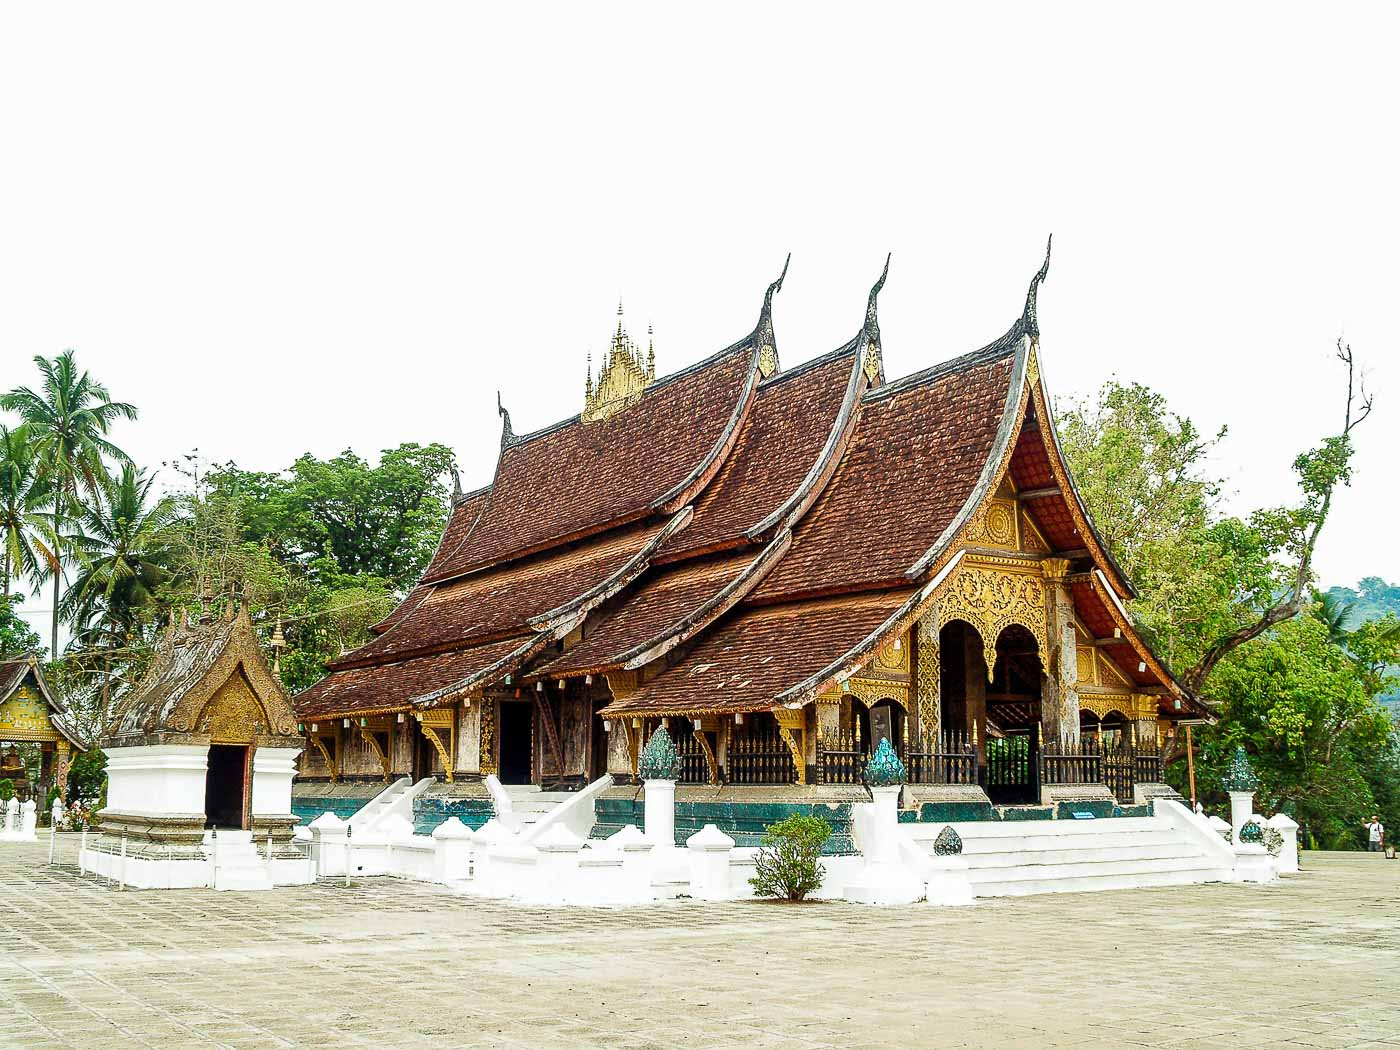 Turismo no Laos - Templo